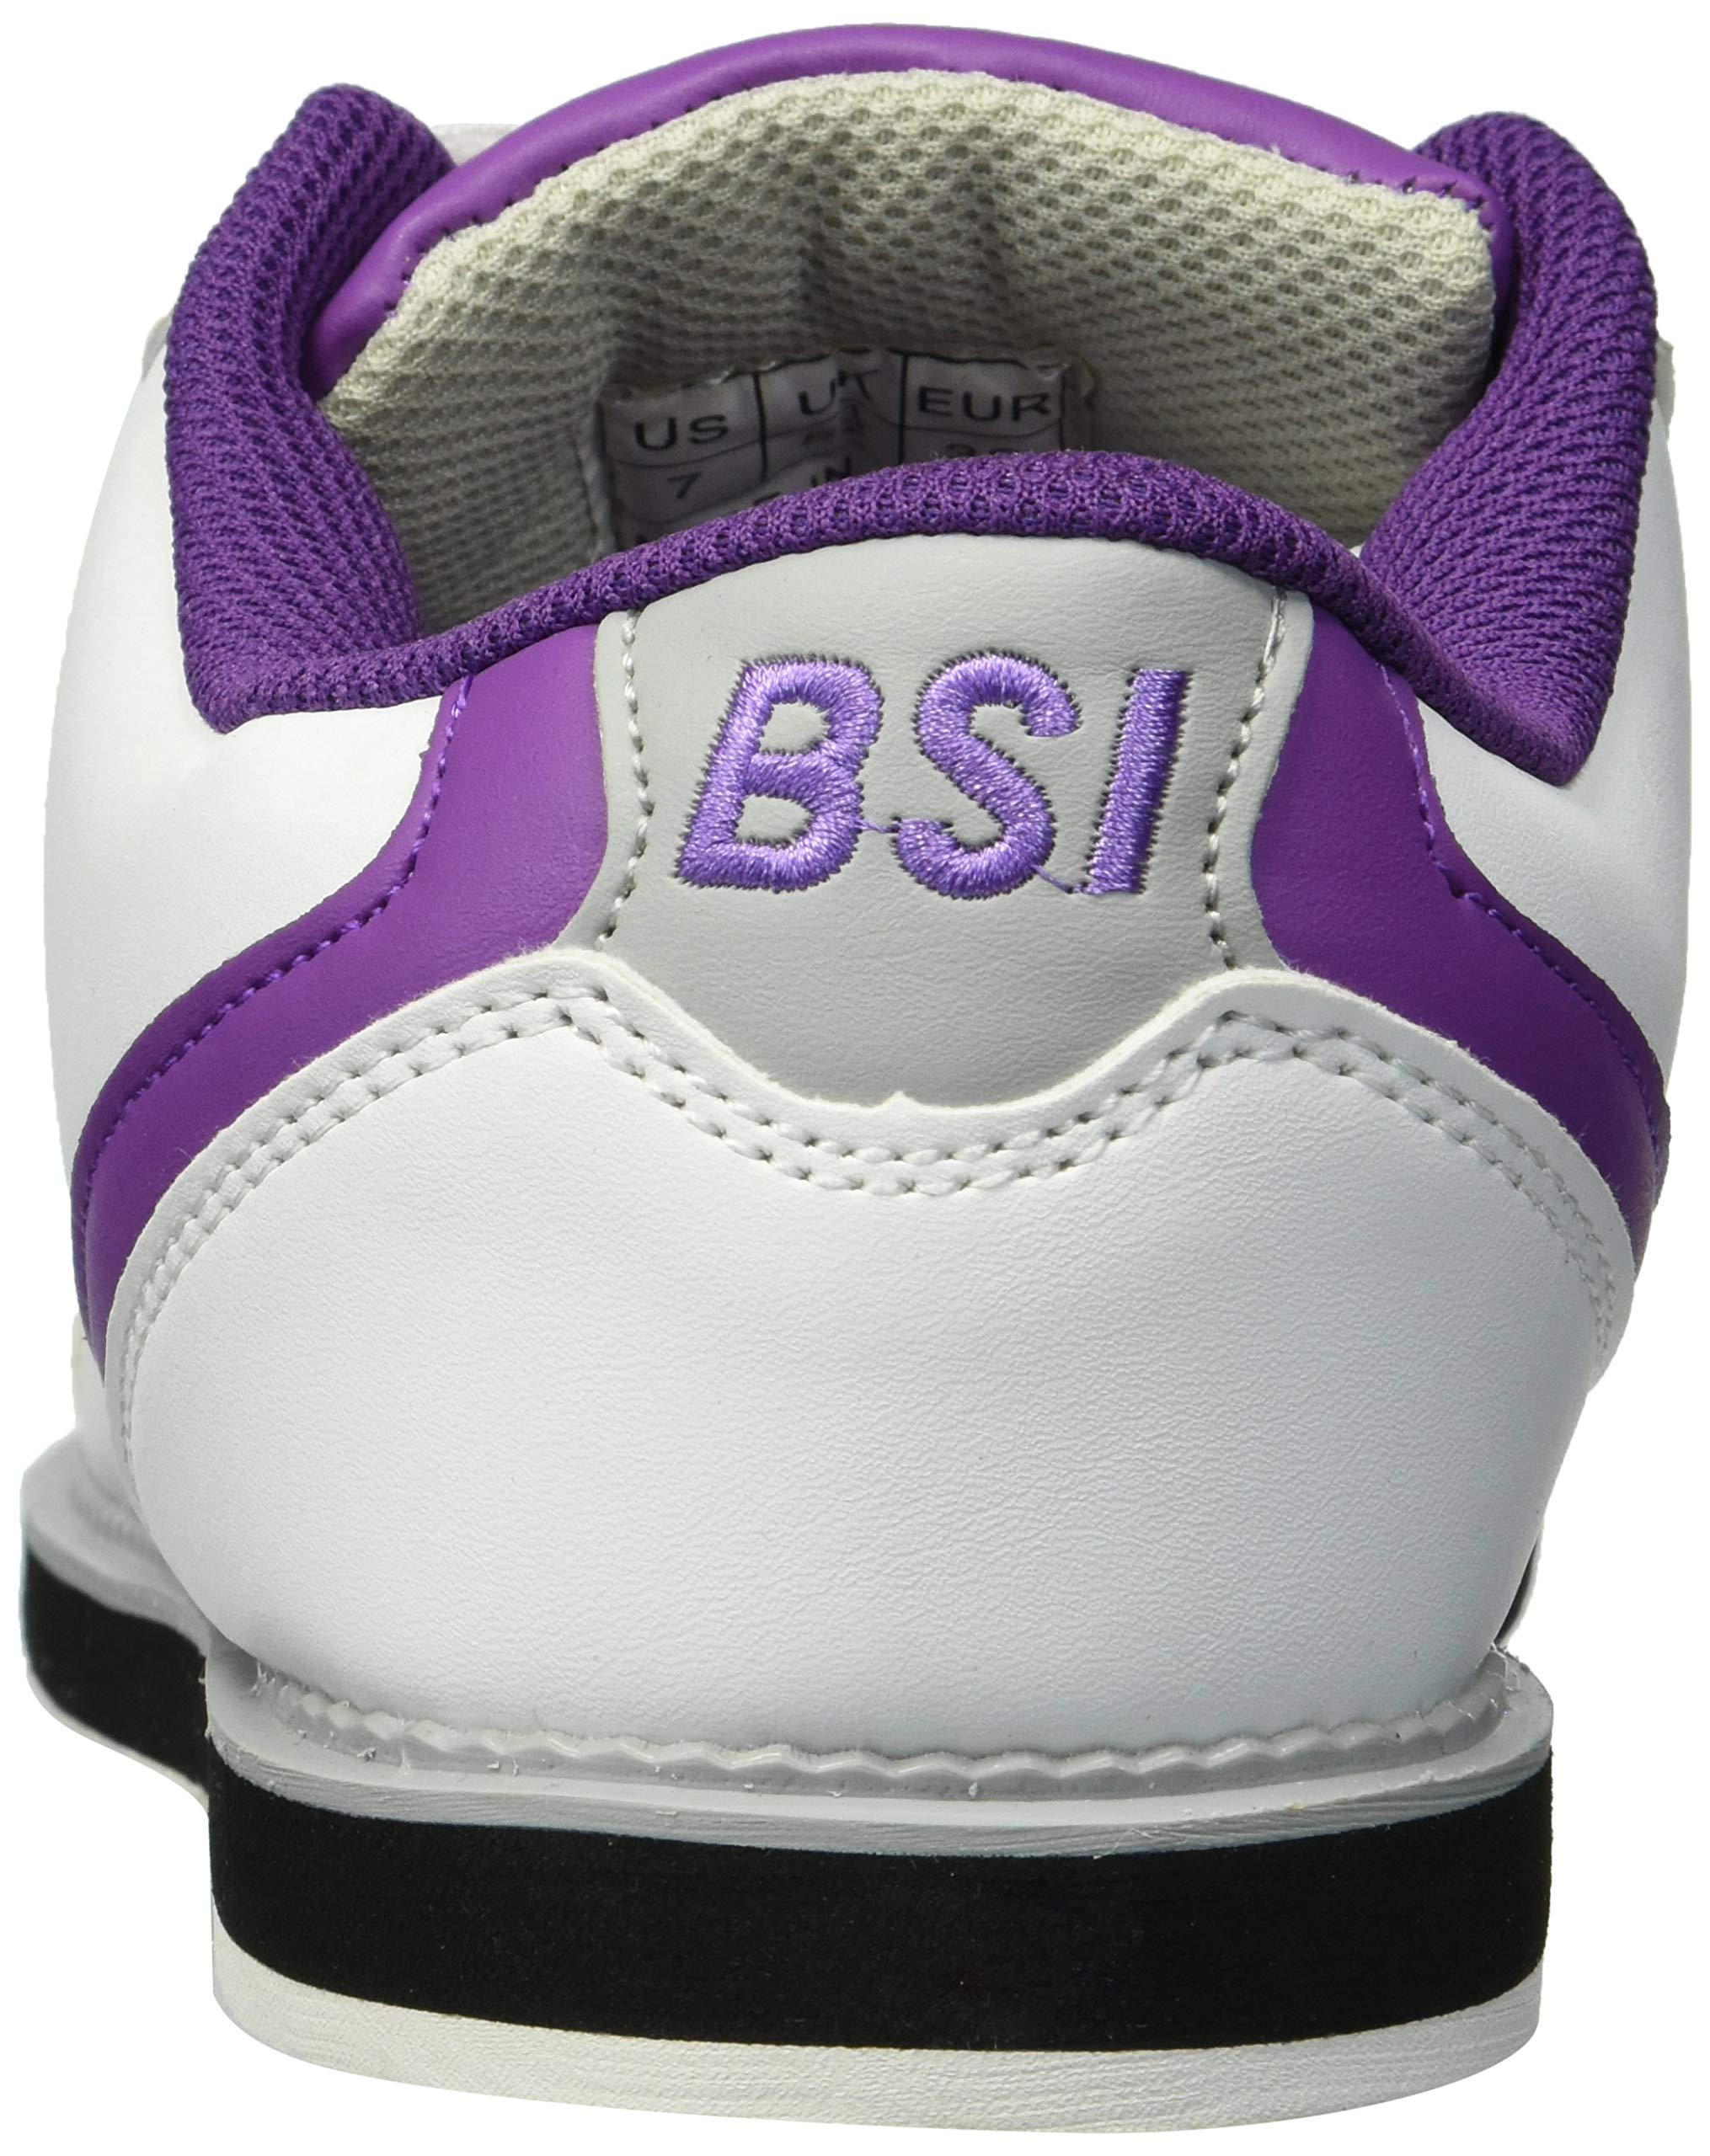 BSI Women's 460 Bowling Shoe, White/Purple, Size 7 by BSI (Image #2)